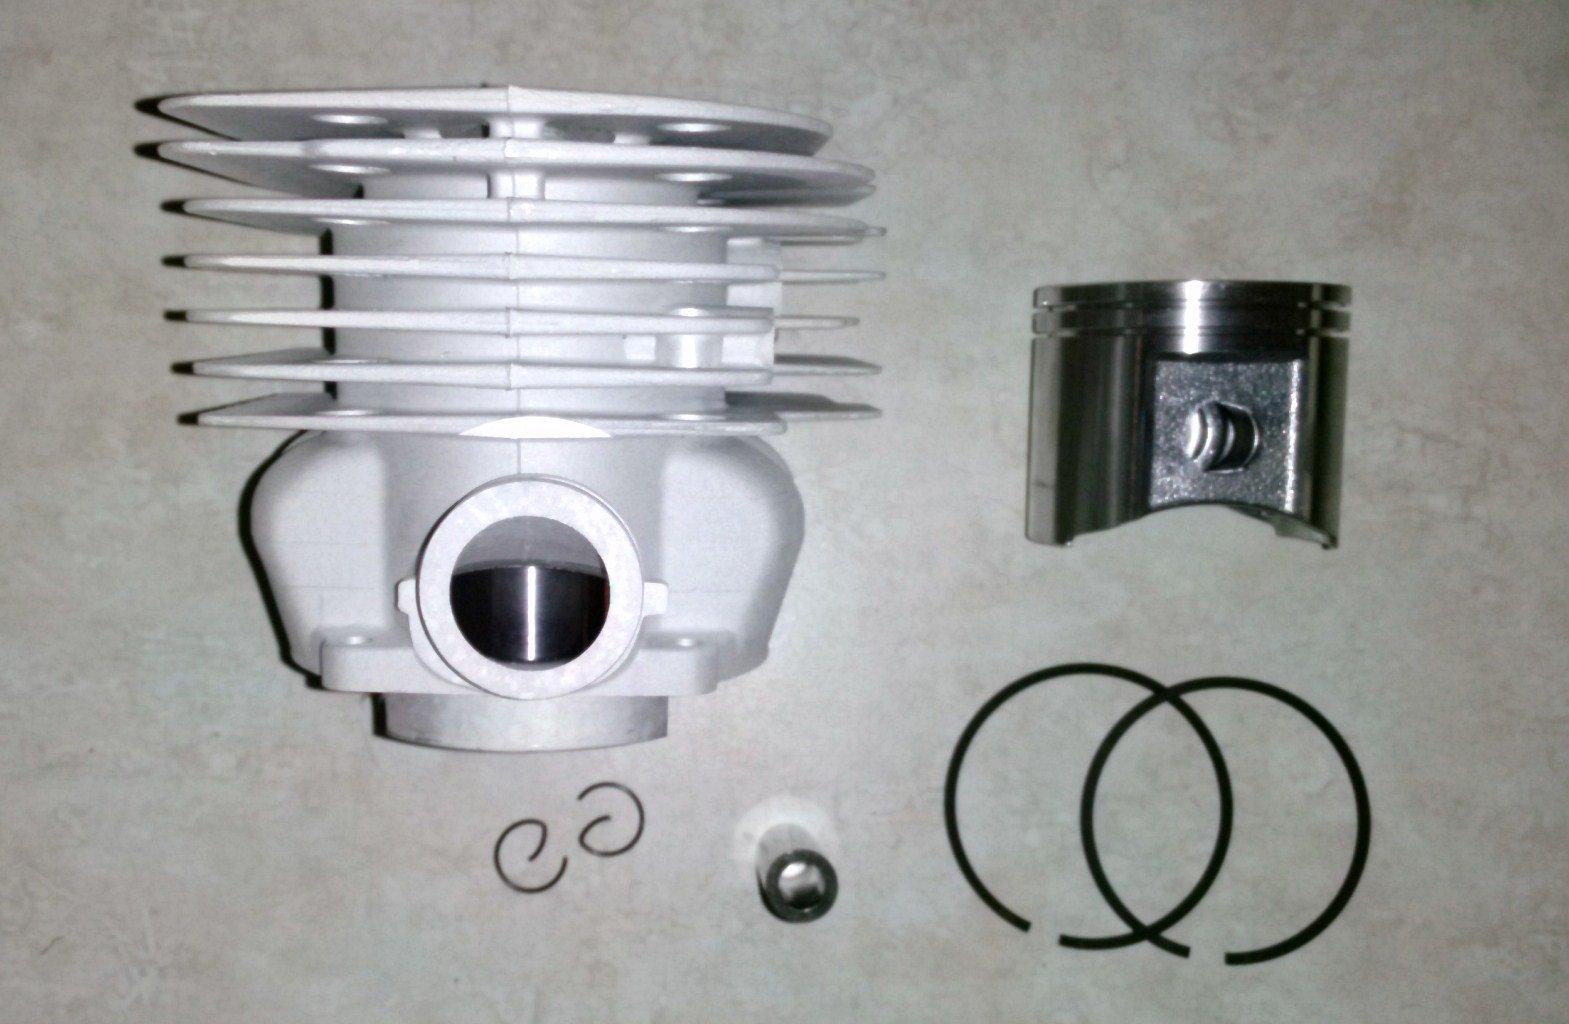 Cylinder Piston Kit for Husqvarna 390 390XP 385 55mm Jonsered 2188 2186 Replaces OEM